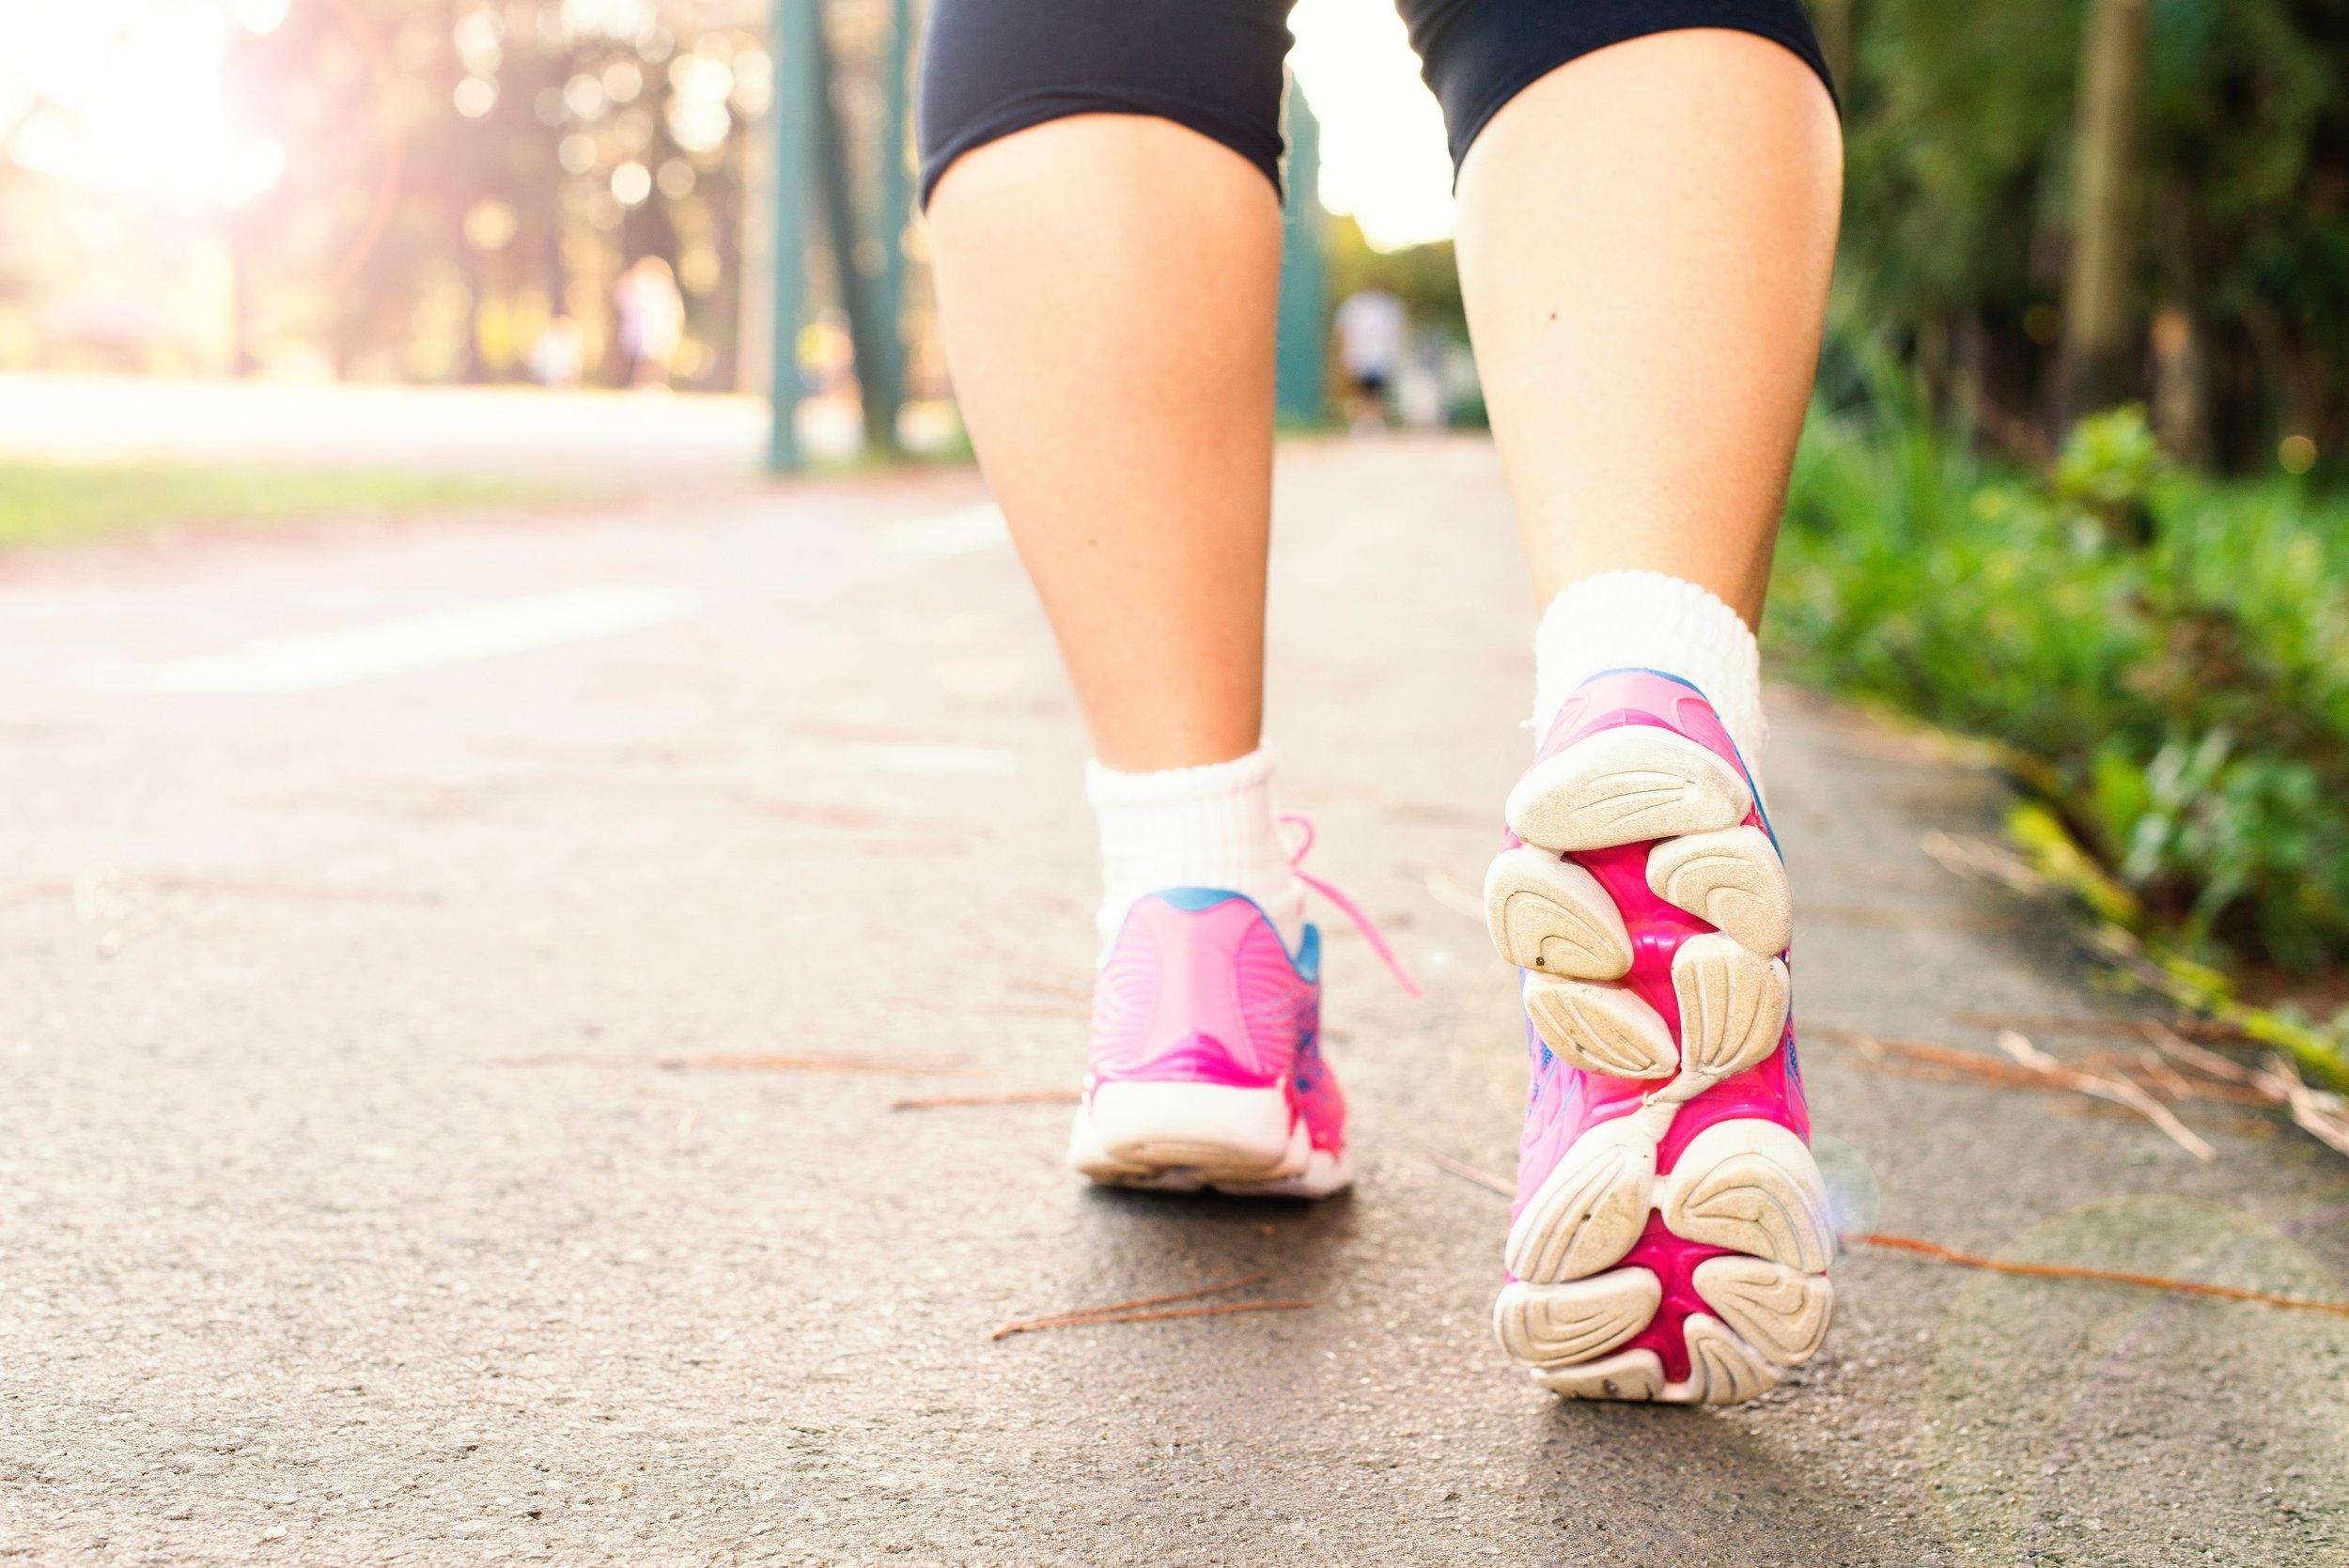 activity-fitness-footwear-1556710.jpg